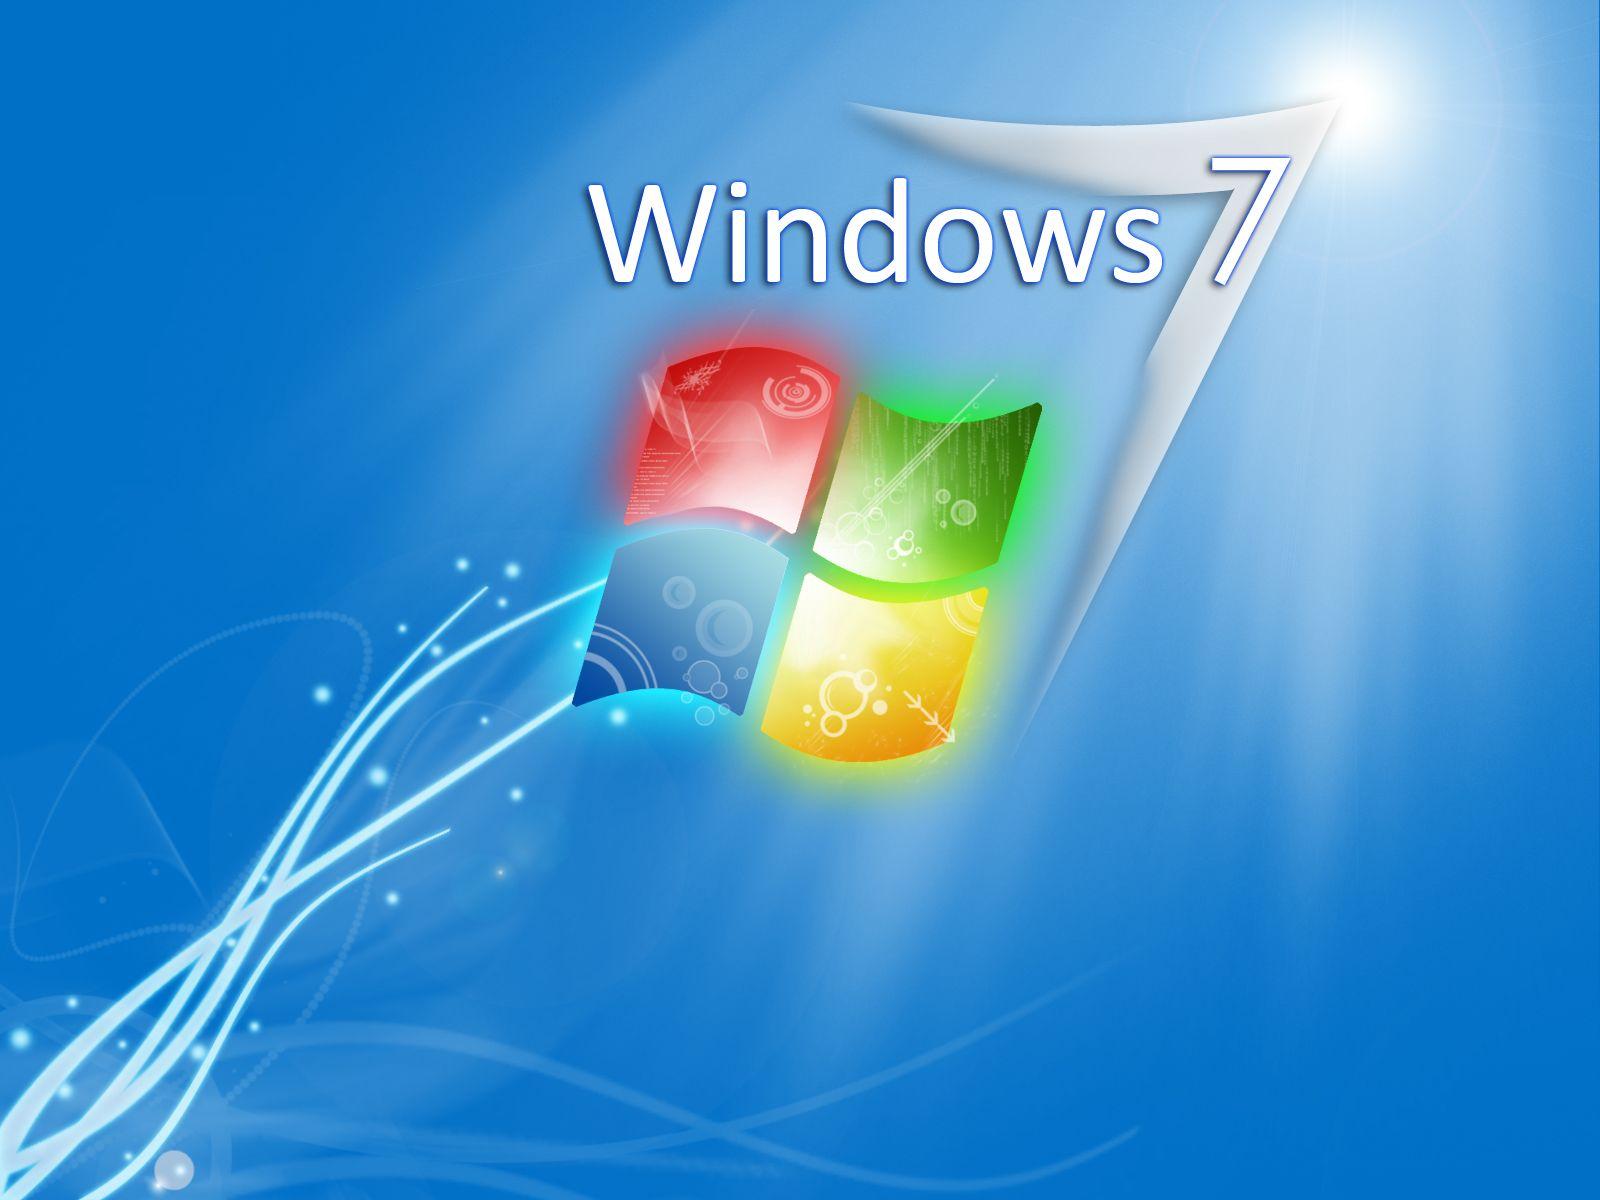 1600x1200 Windows 7 desktop PC and Mac wallpaper